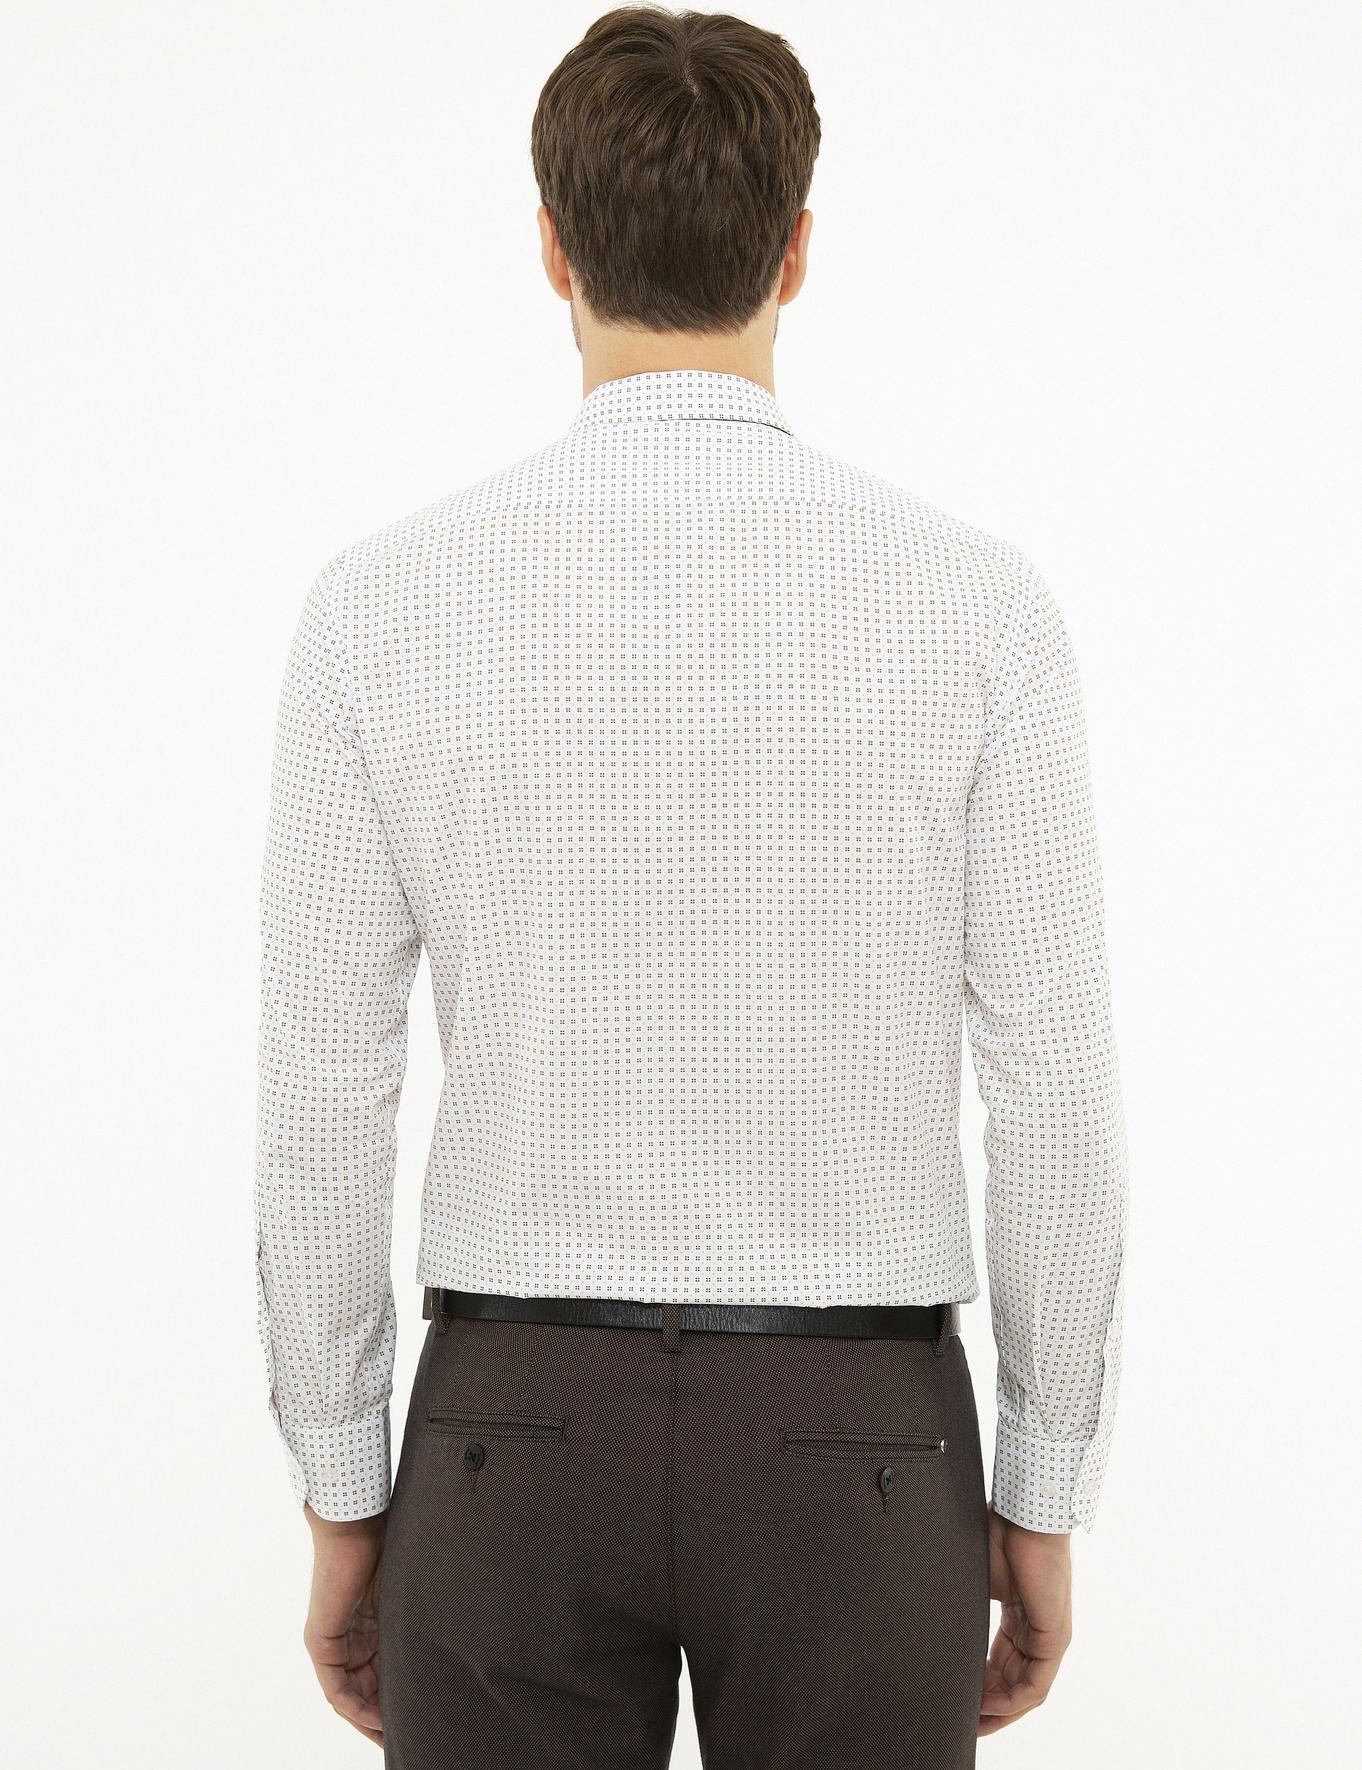 Kahverengi Slim Fit Gömlek - 50218010032